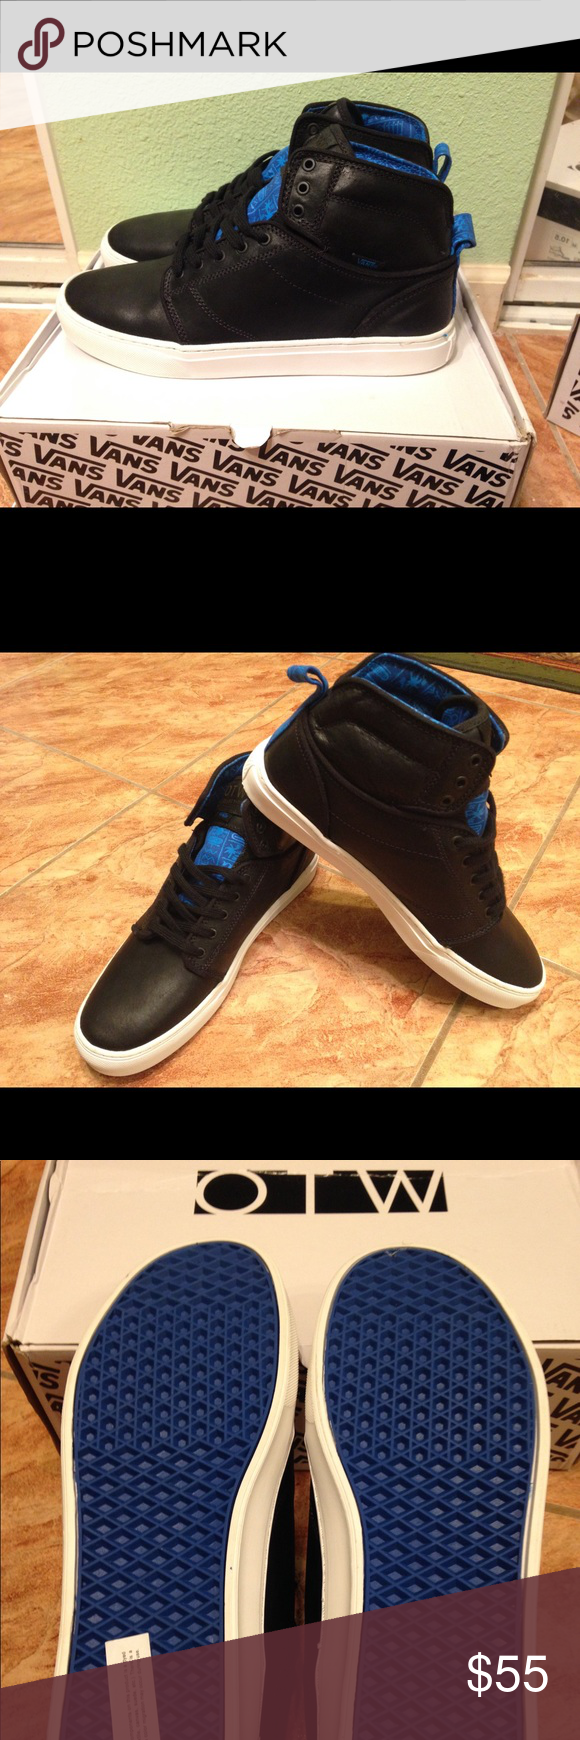 248cda41c6 New Vans Alomar Black OTW Men s Shoes Men s 11.5 New Vans Alomar (Tribes) Black  OTW Collection Men s Skate Shoes Men s 11.5 Vans Shoes Sneakers